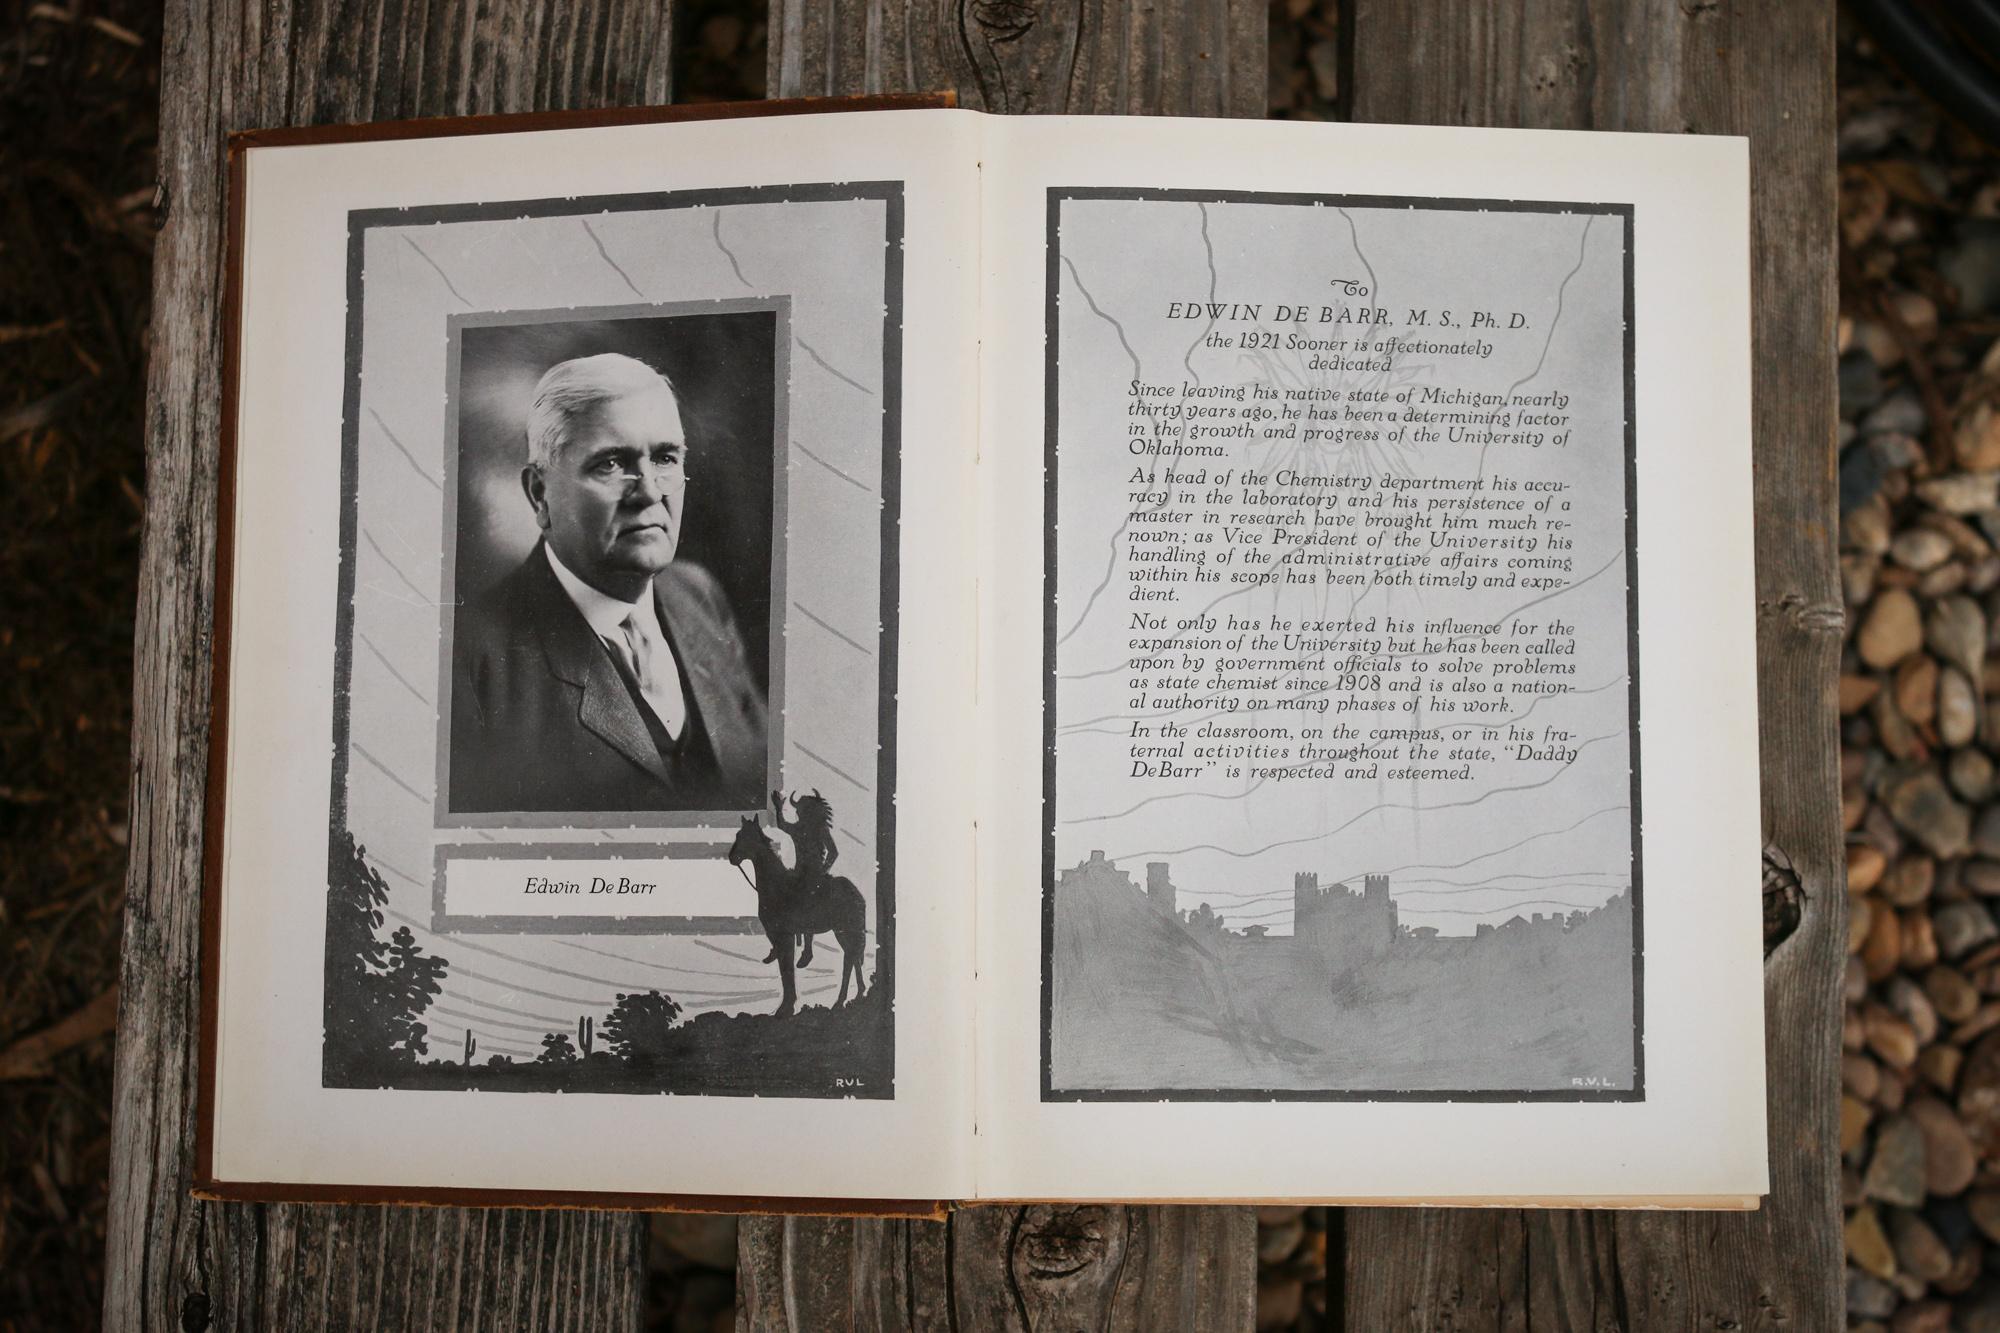 1921 Sooner yearbook dedication to Edwin DeBarr